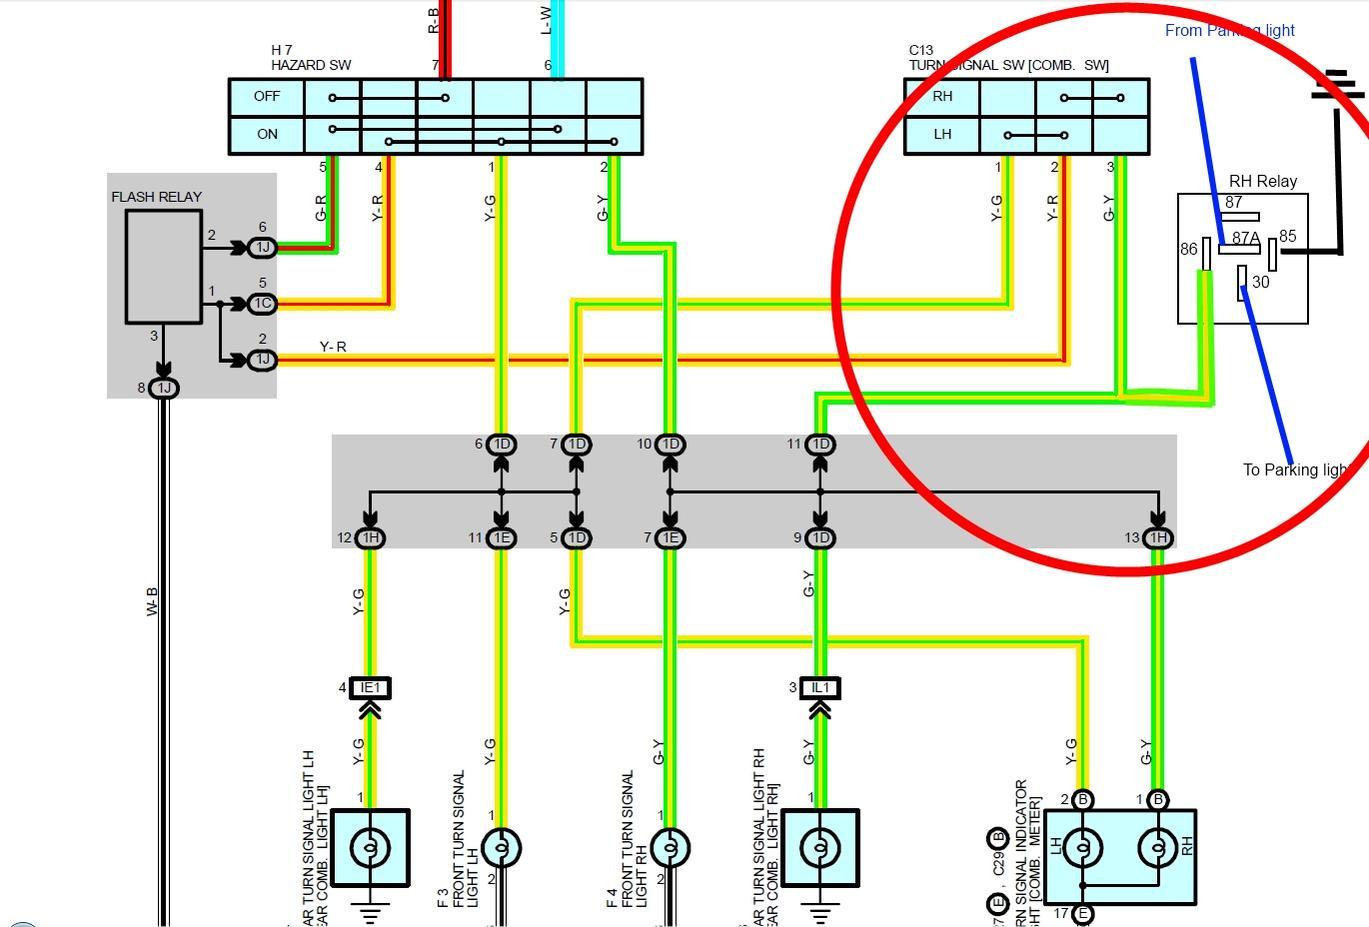 zx_3362] 84 85 toyota coil ignitor wiring schematics schematic wiring  apom terch opogo exmet terch rele rmine inki minaga simij kook scata ologi  cana greas hendil phil cajos hendil mohammedshrine librar wiring 101